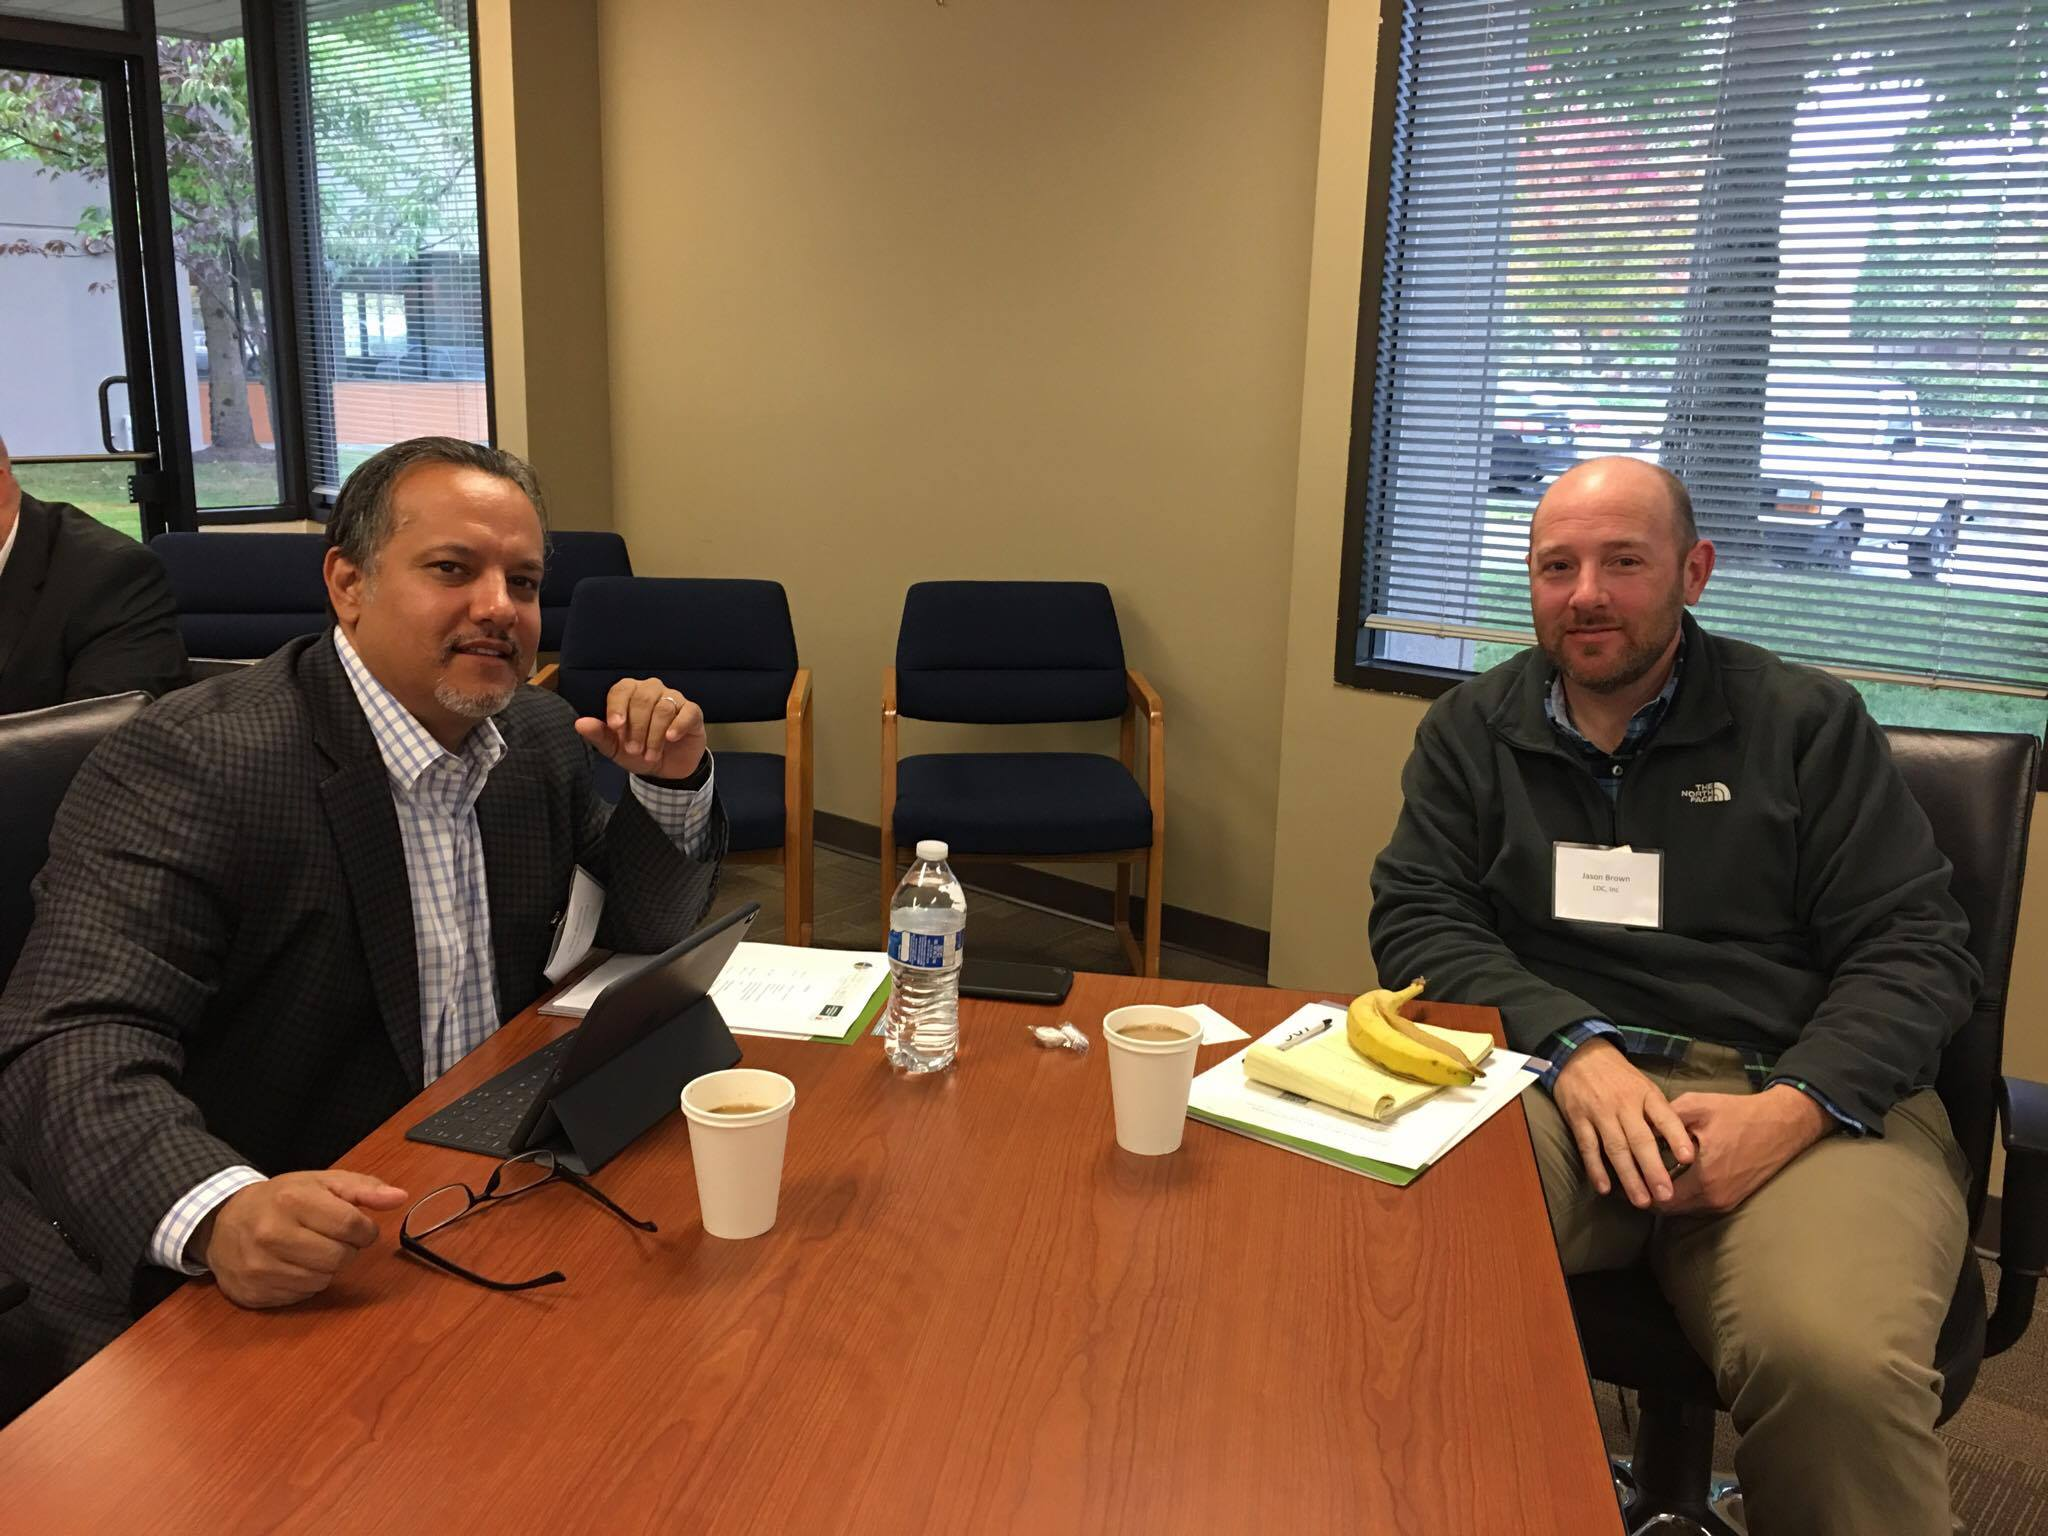 Chris Barrios (Nvelup Consulting) and Jason Brown (LDC, Inc.)